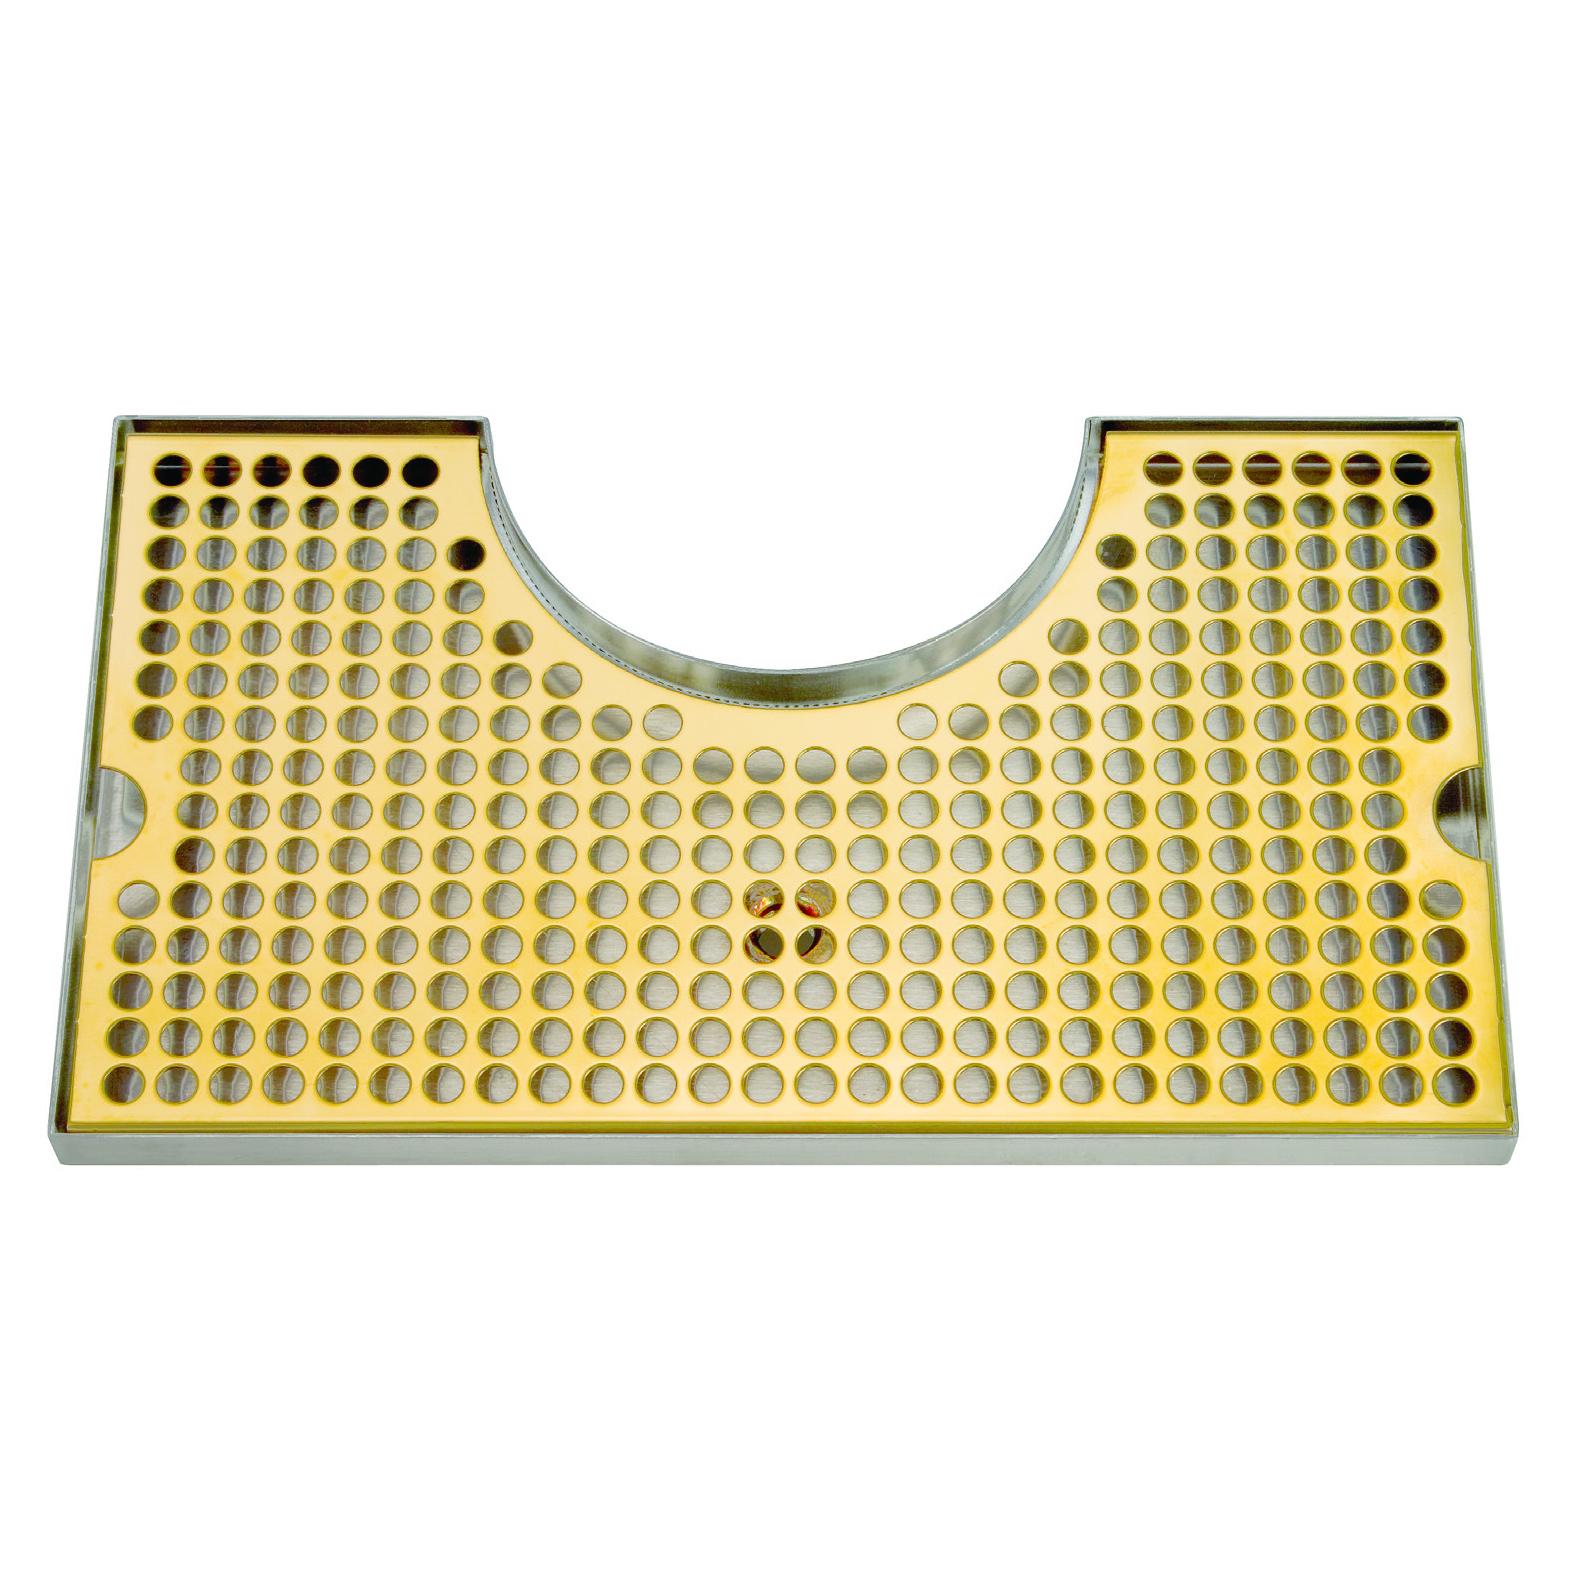 Micro Matic USA DP-1020DSSPVD drip tray trough, beverage